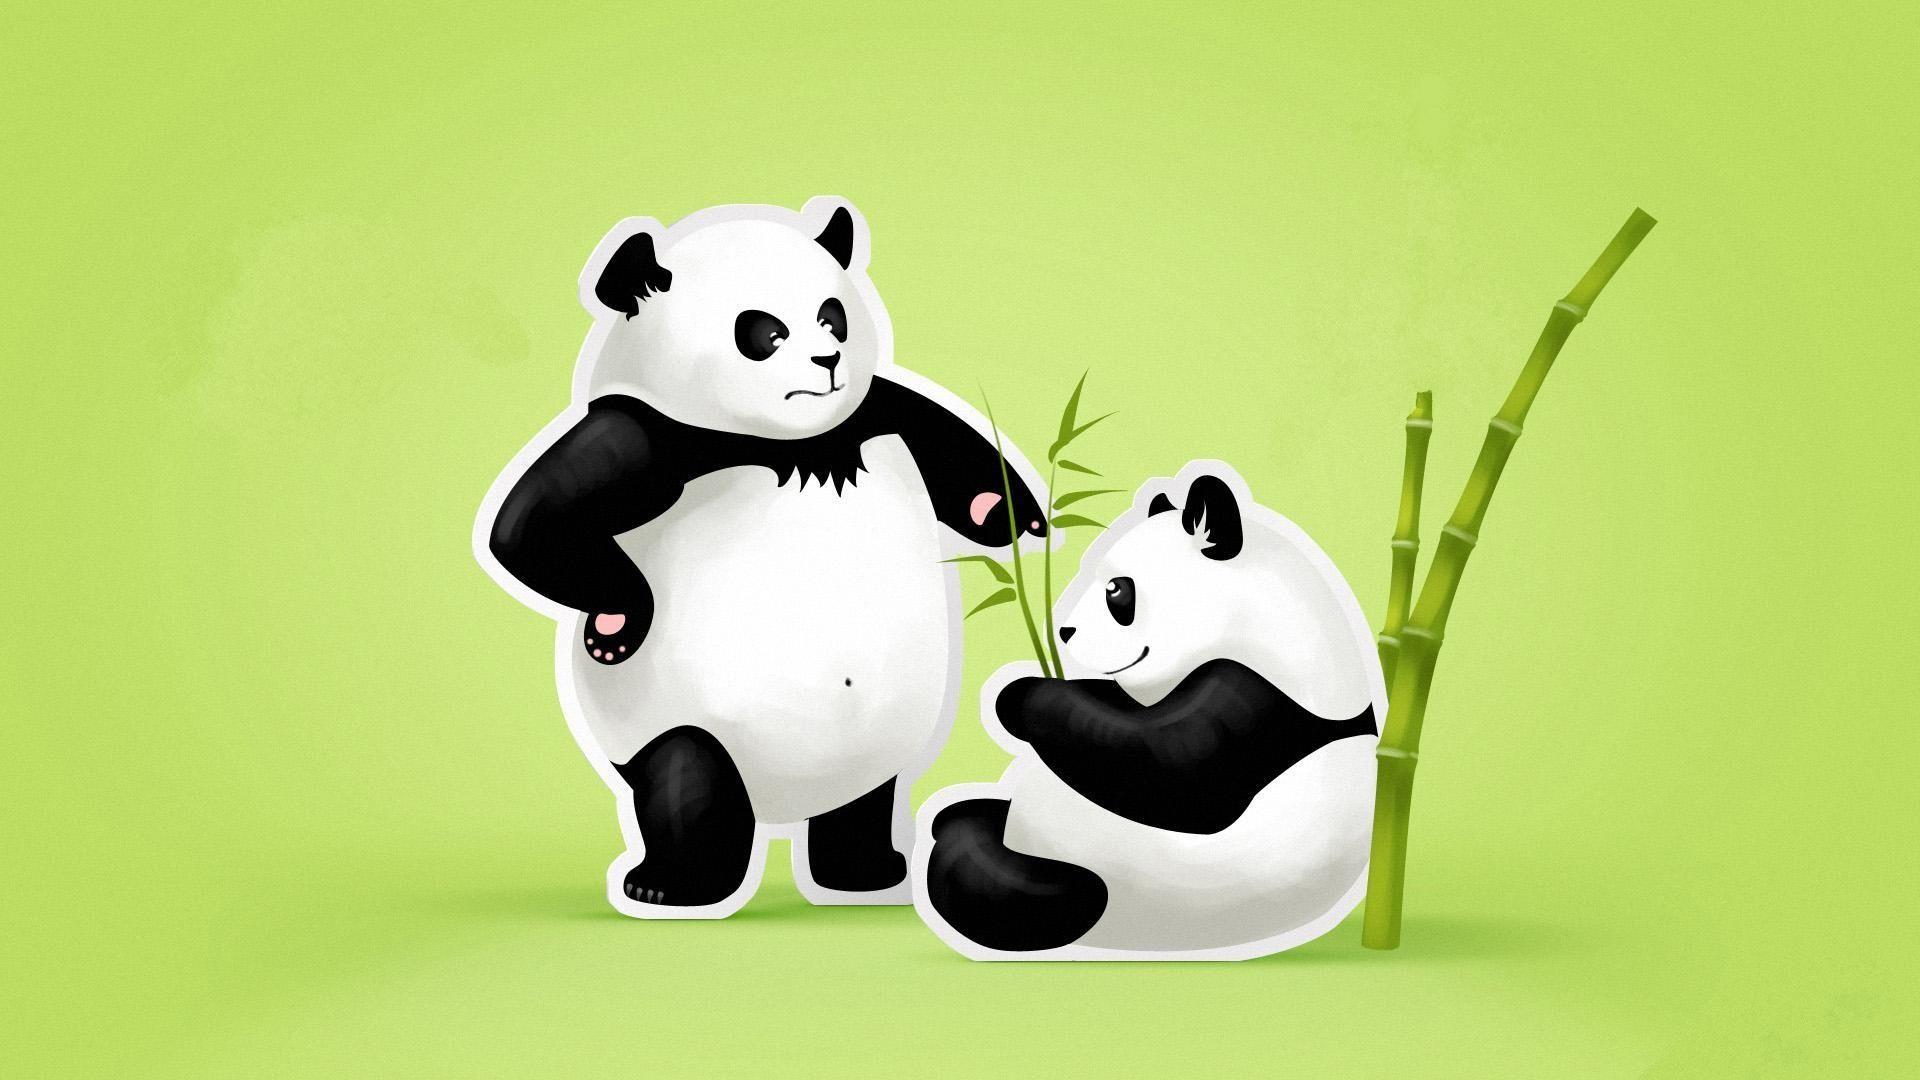 20 Best Panda Wallpaper For Your Desktop Cute Panda Wallpaper Panda Wallpapers Panda Images